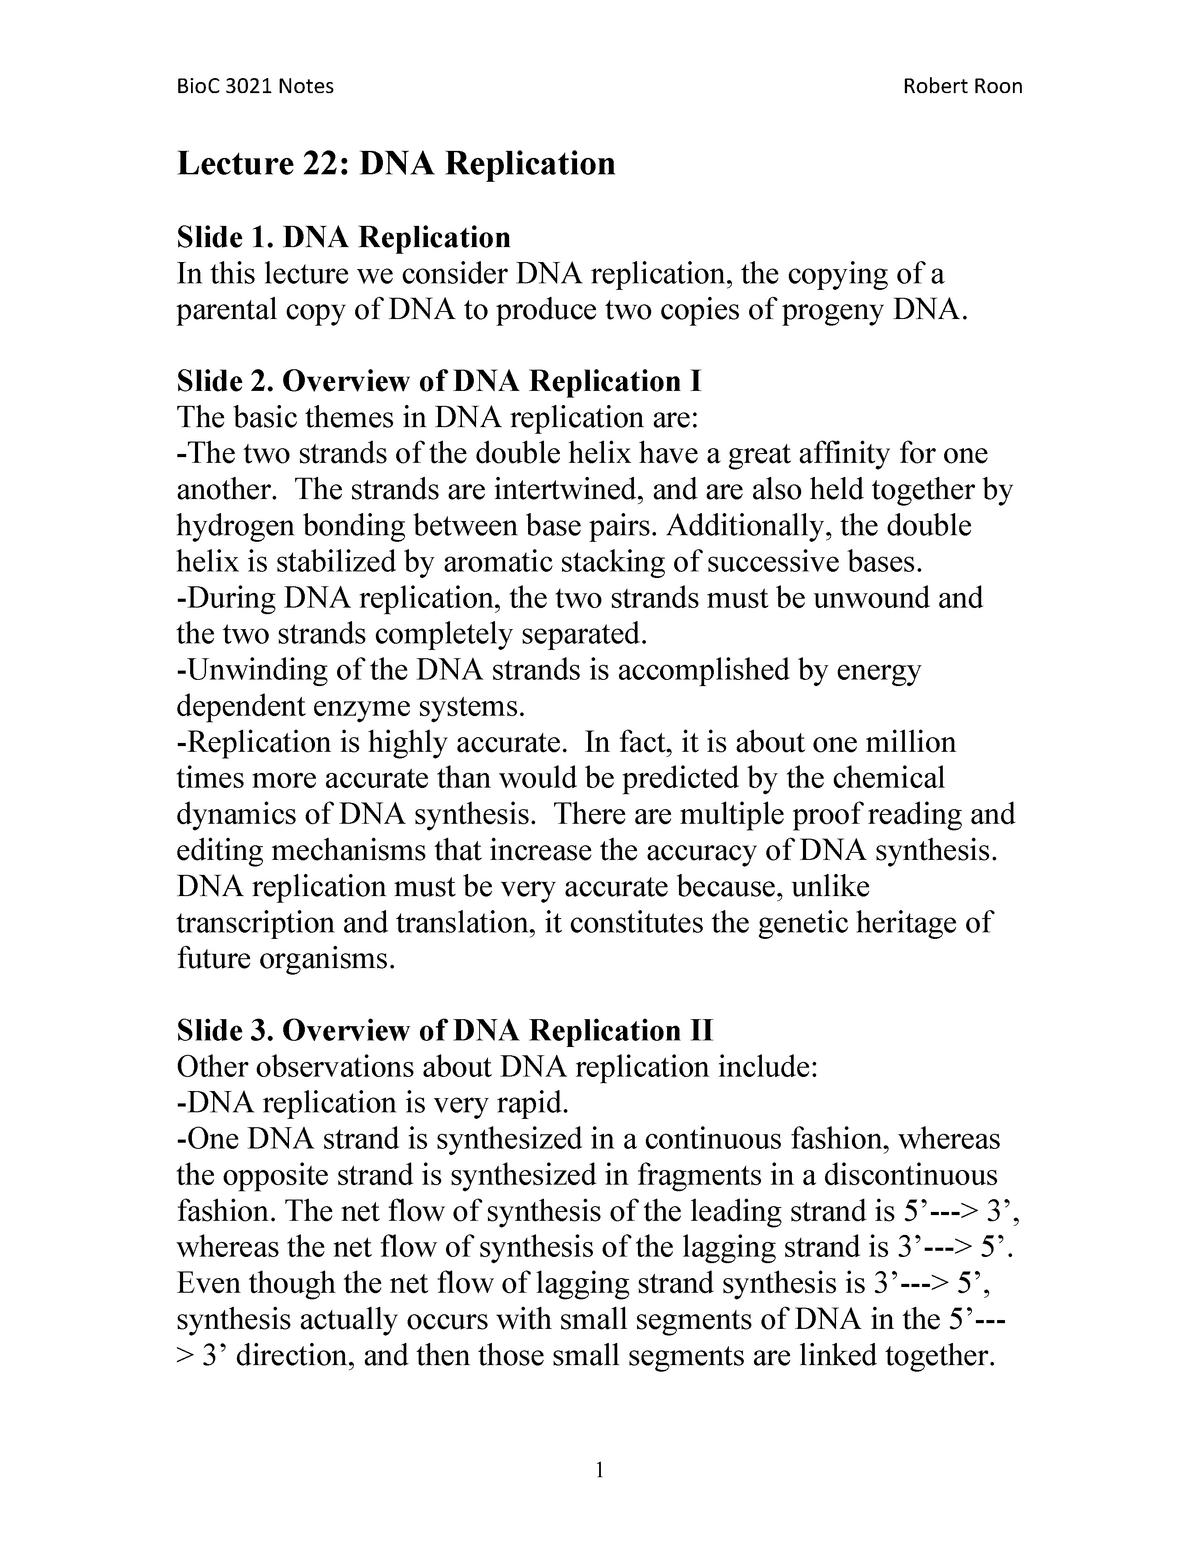 Lecture 22 DNA Replication - BIOC 3021: Biochemistry - StuDocu